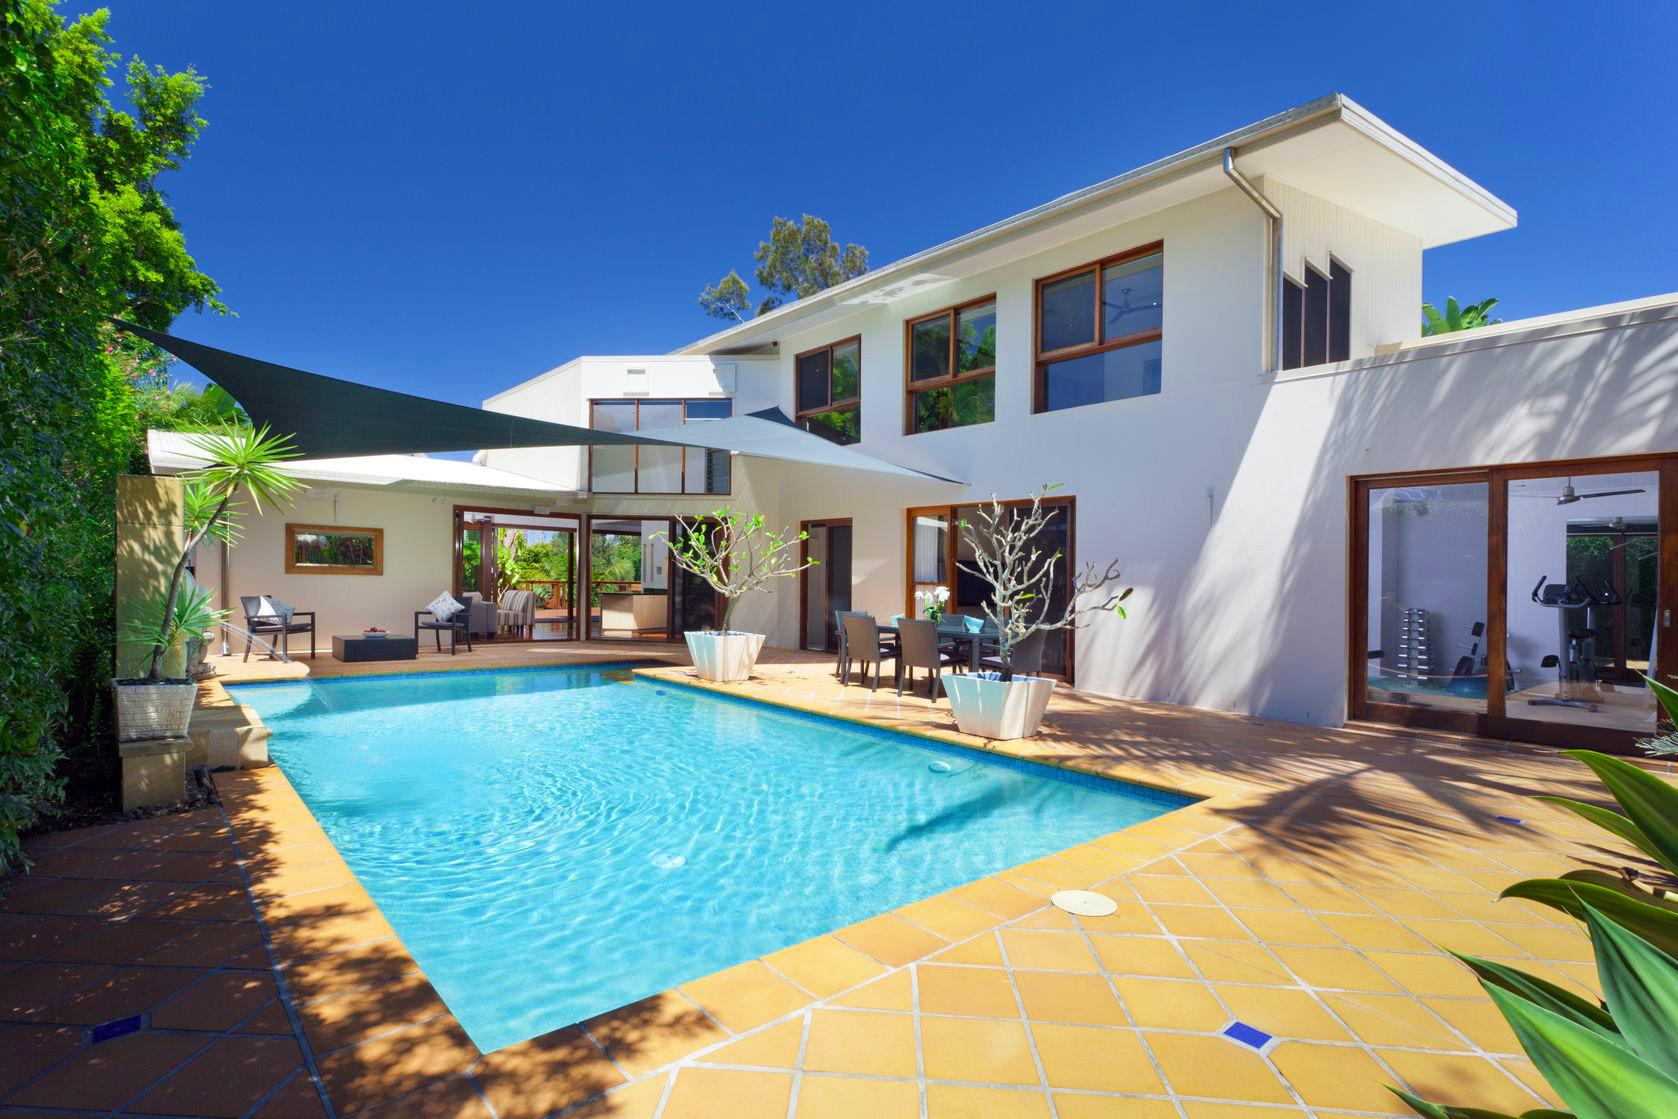 RMR Real Estate Management and Rentals